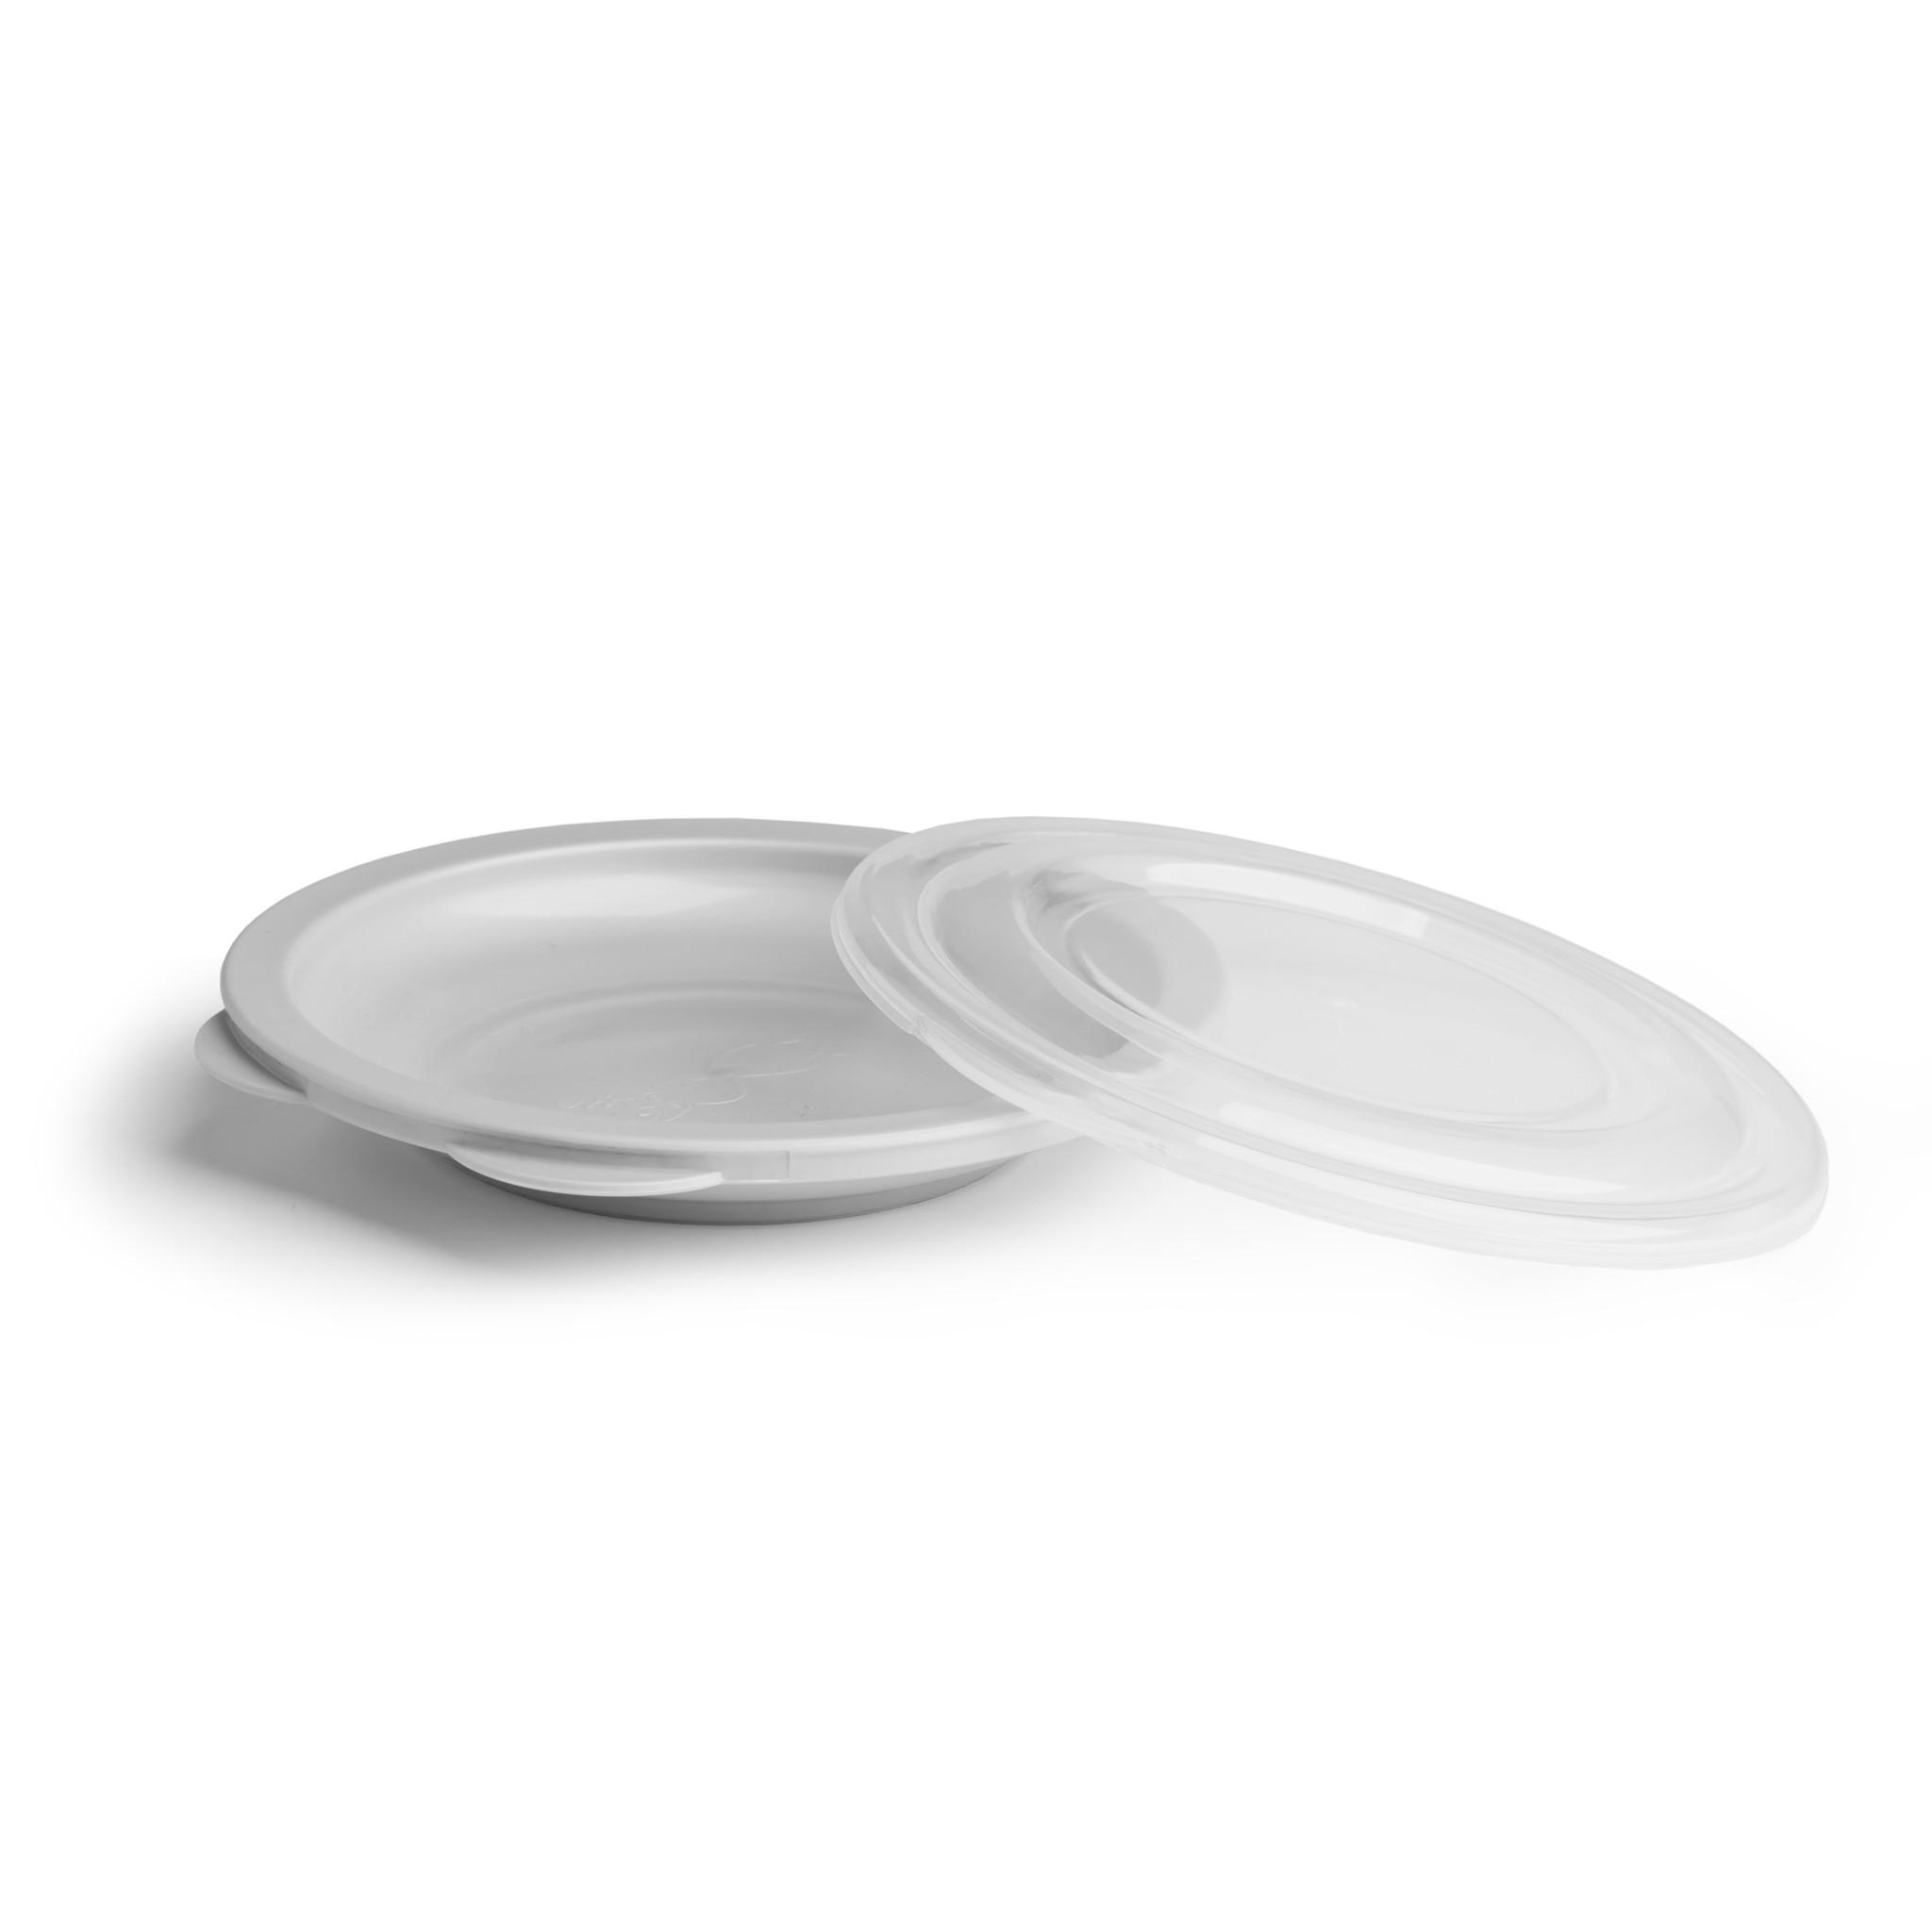 Herobility Herobility HeroEcoPlate Plate Mist Grey